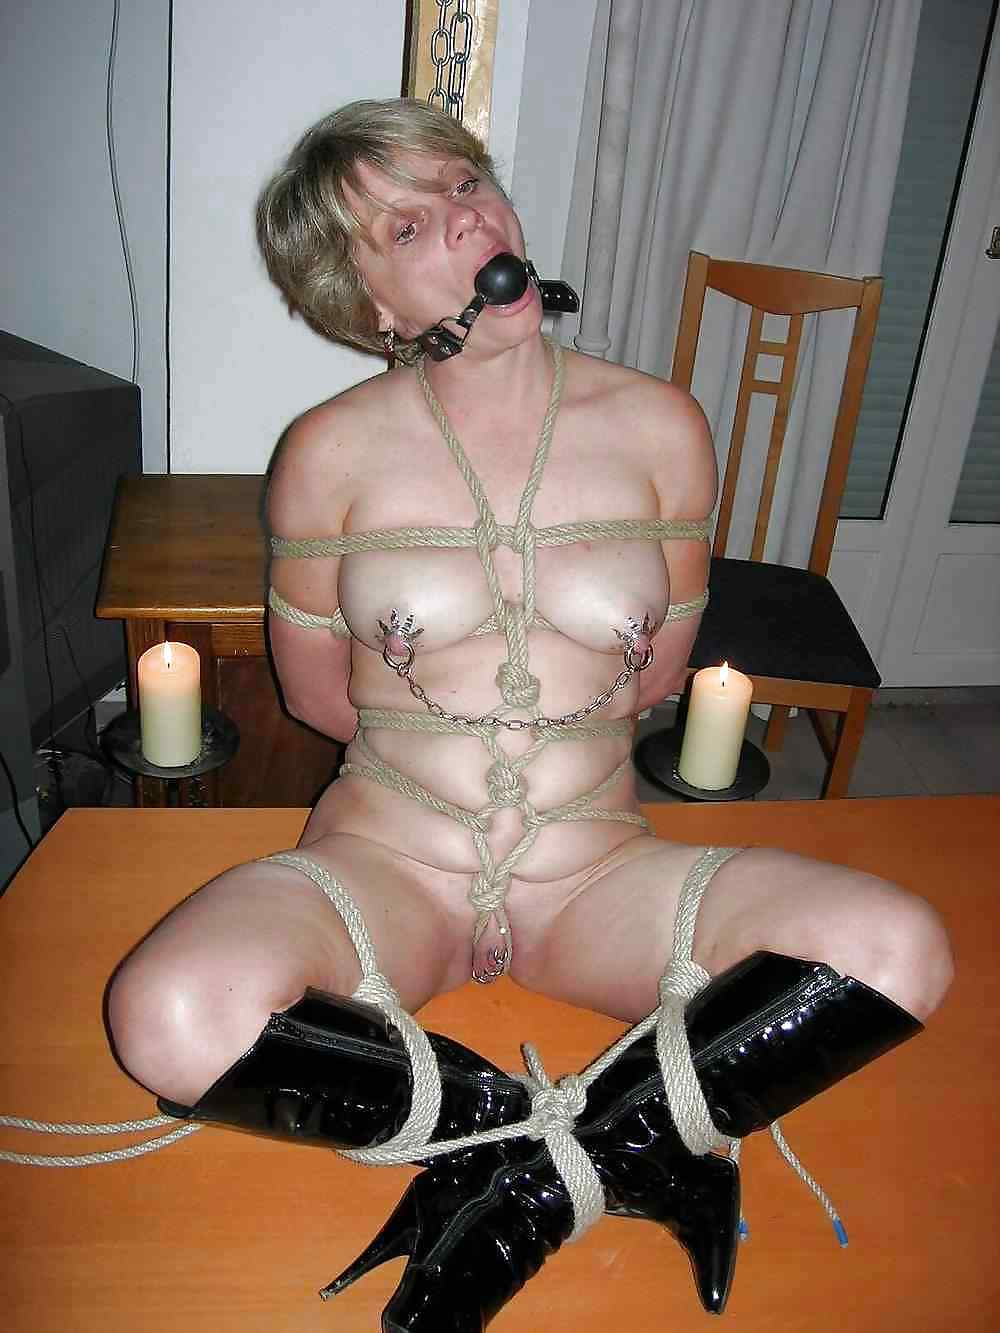 Xxx mature bdsm, sexy hot nude female demons